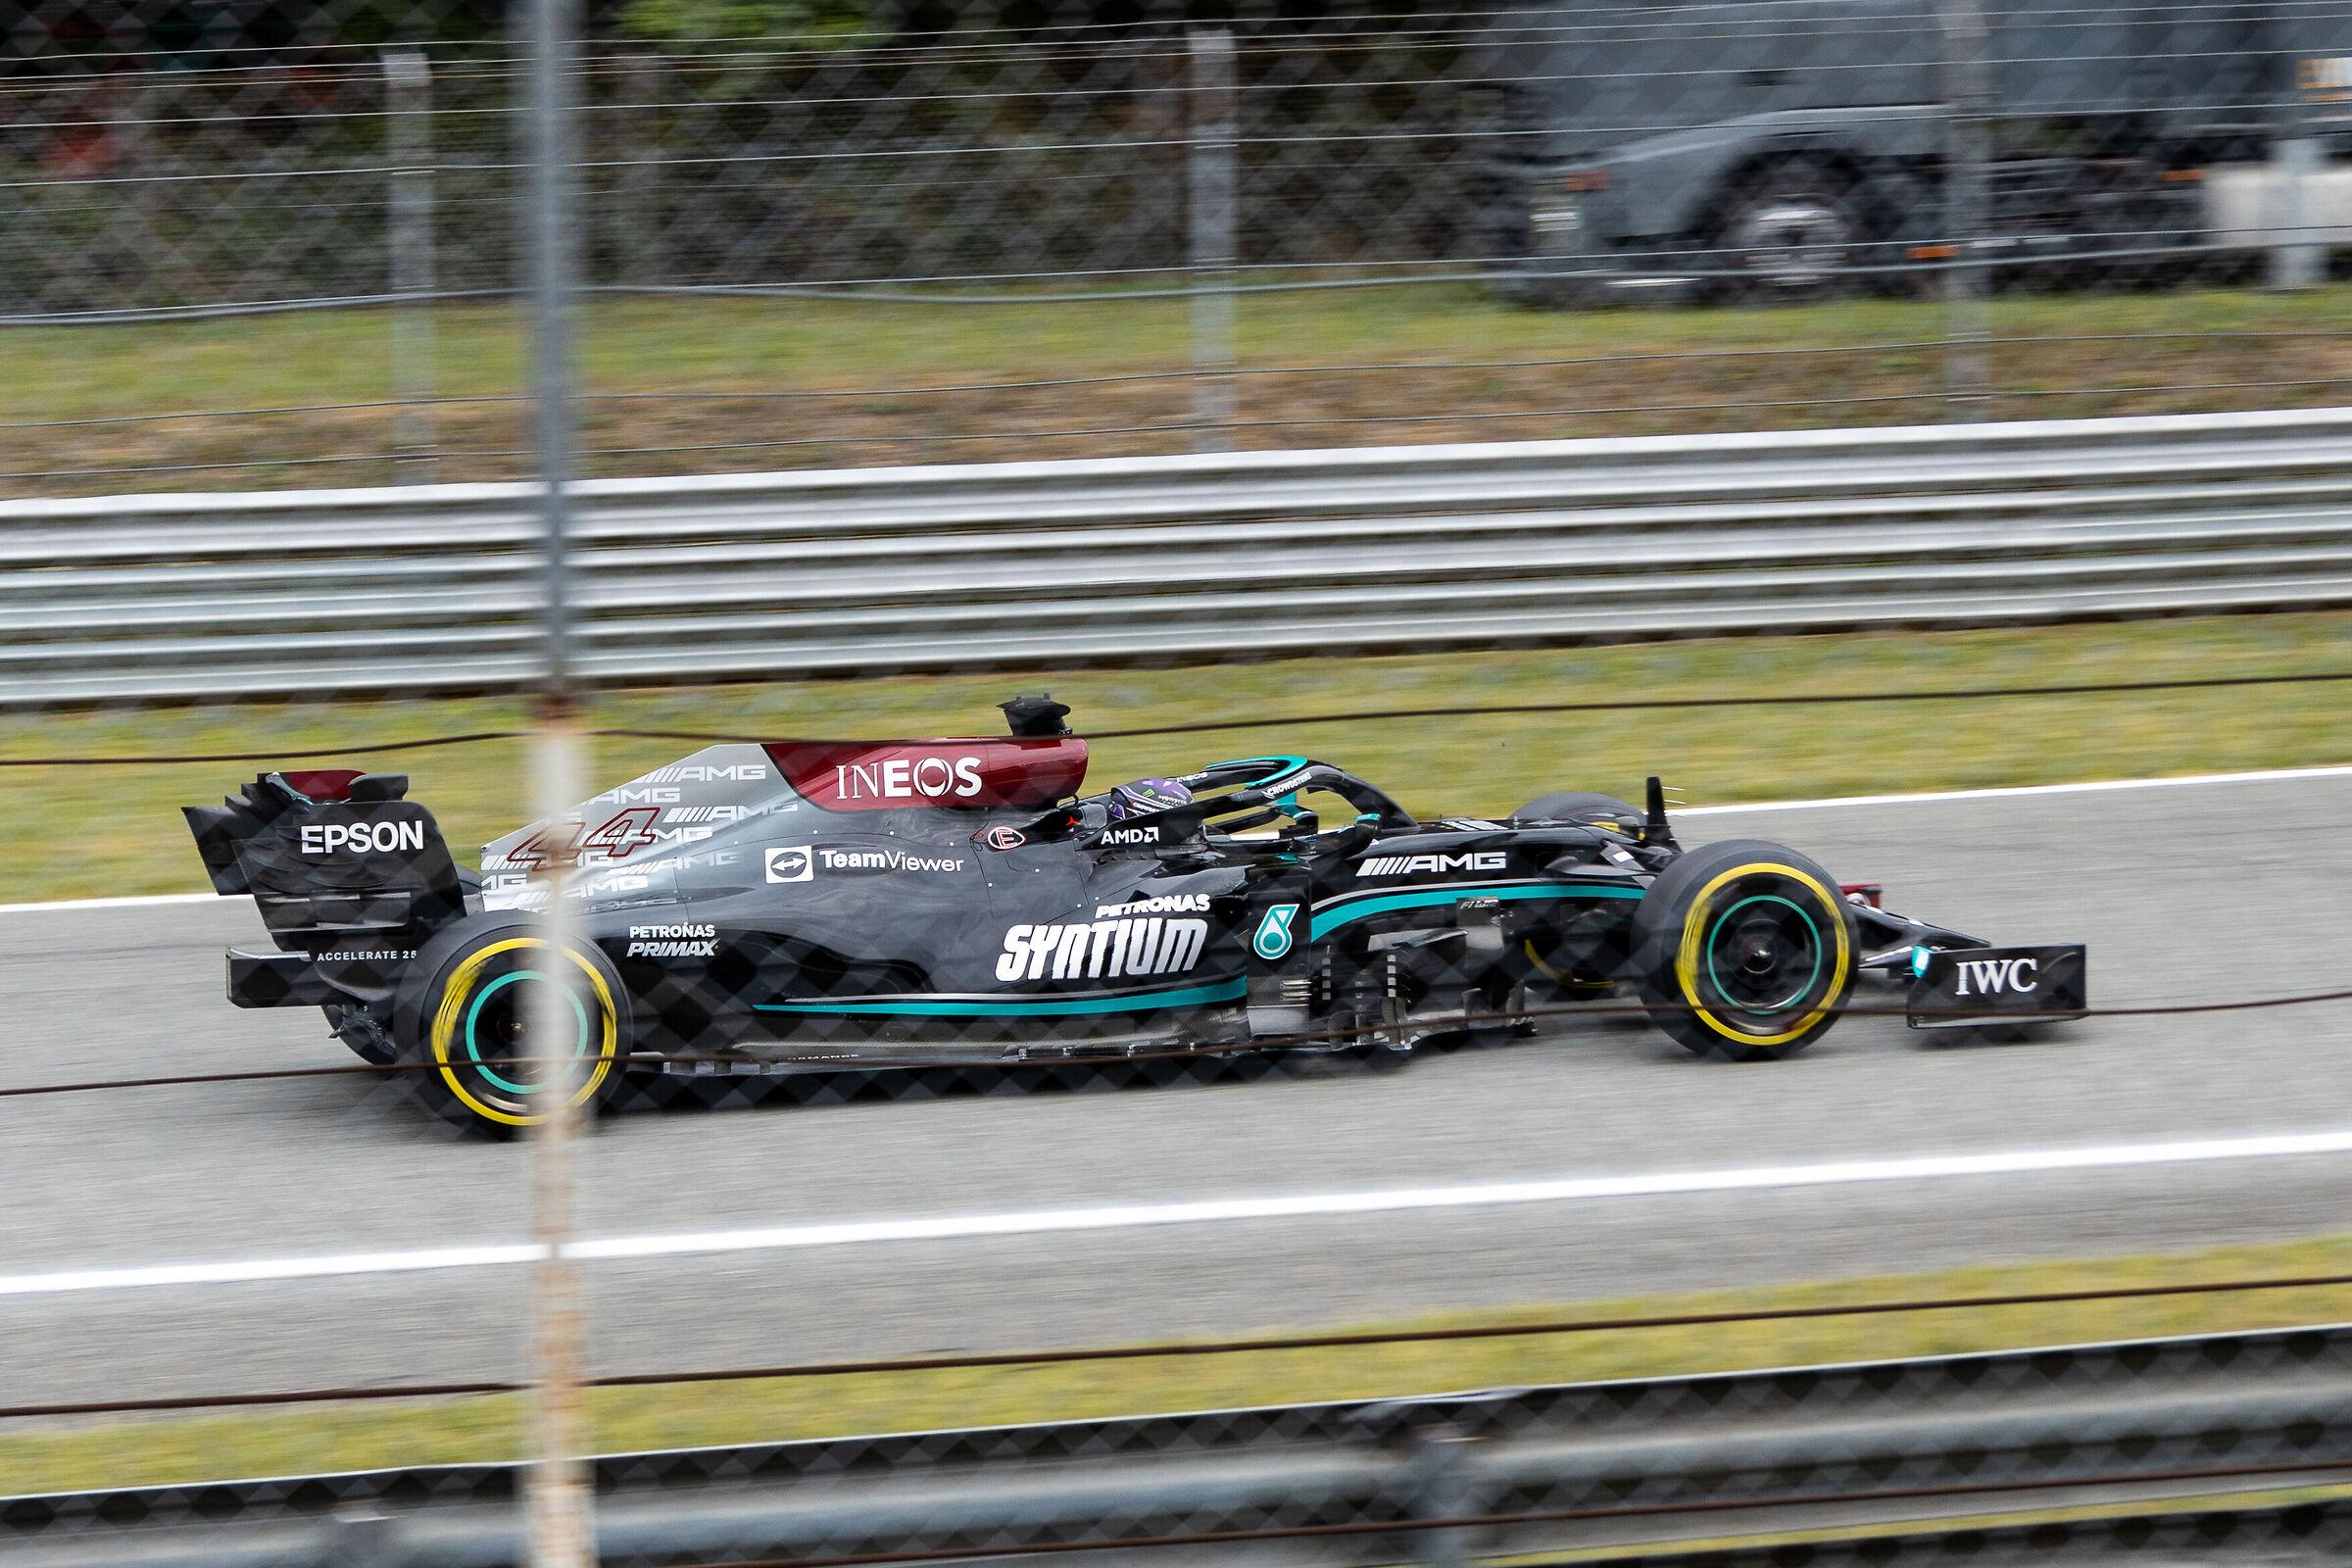 Lewis Hamilton - Monza 2021...